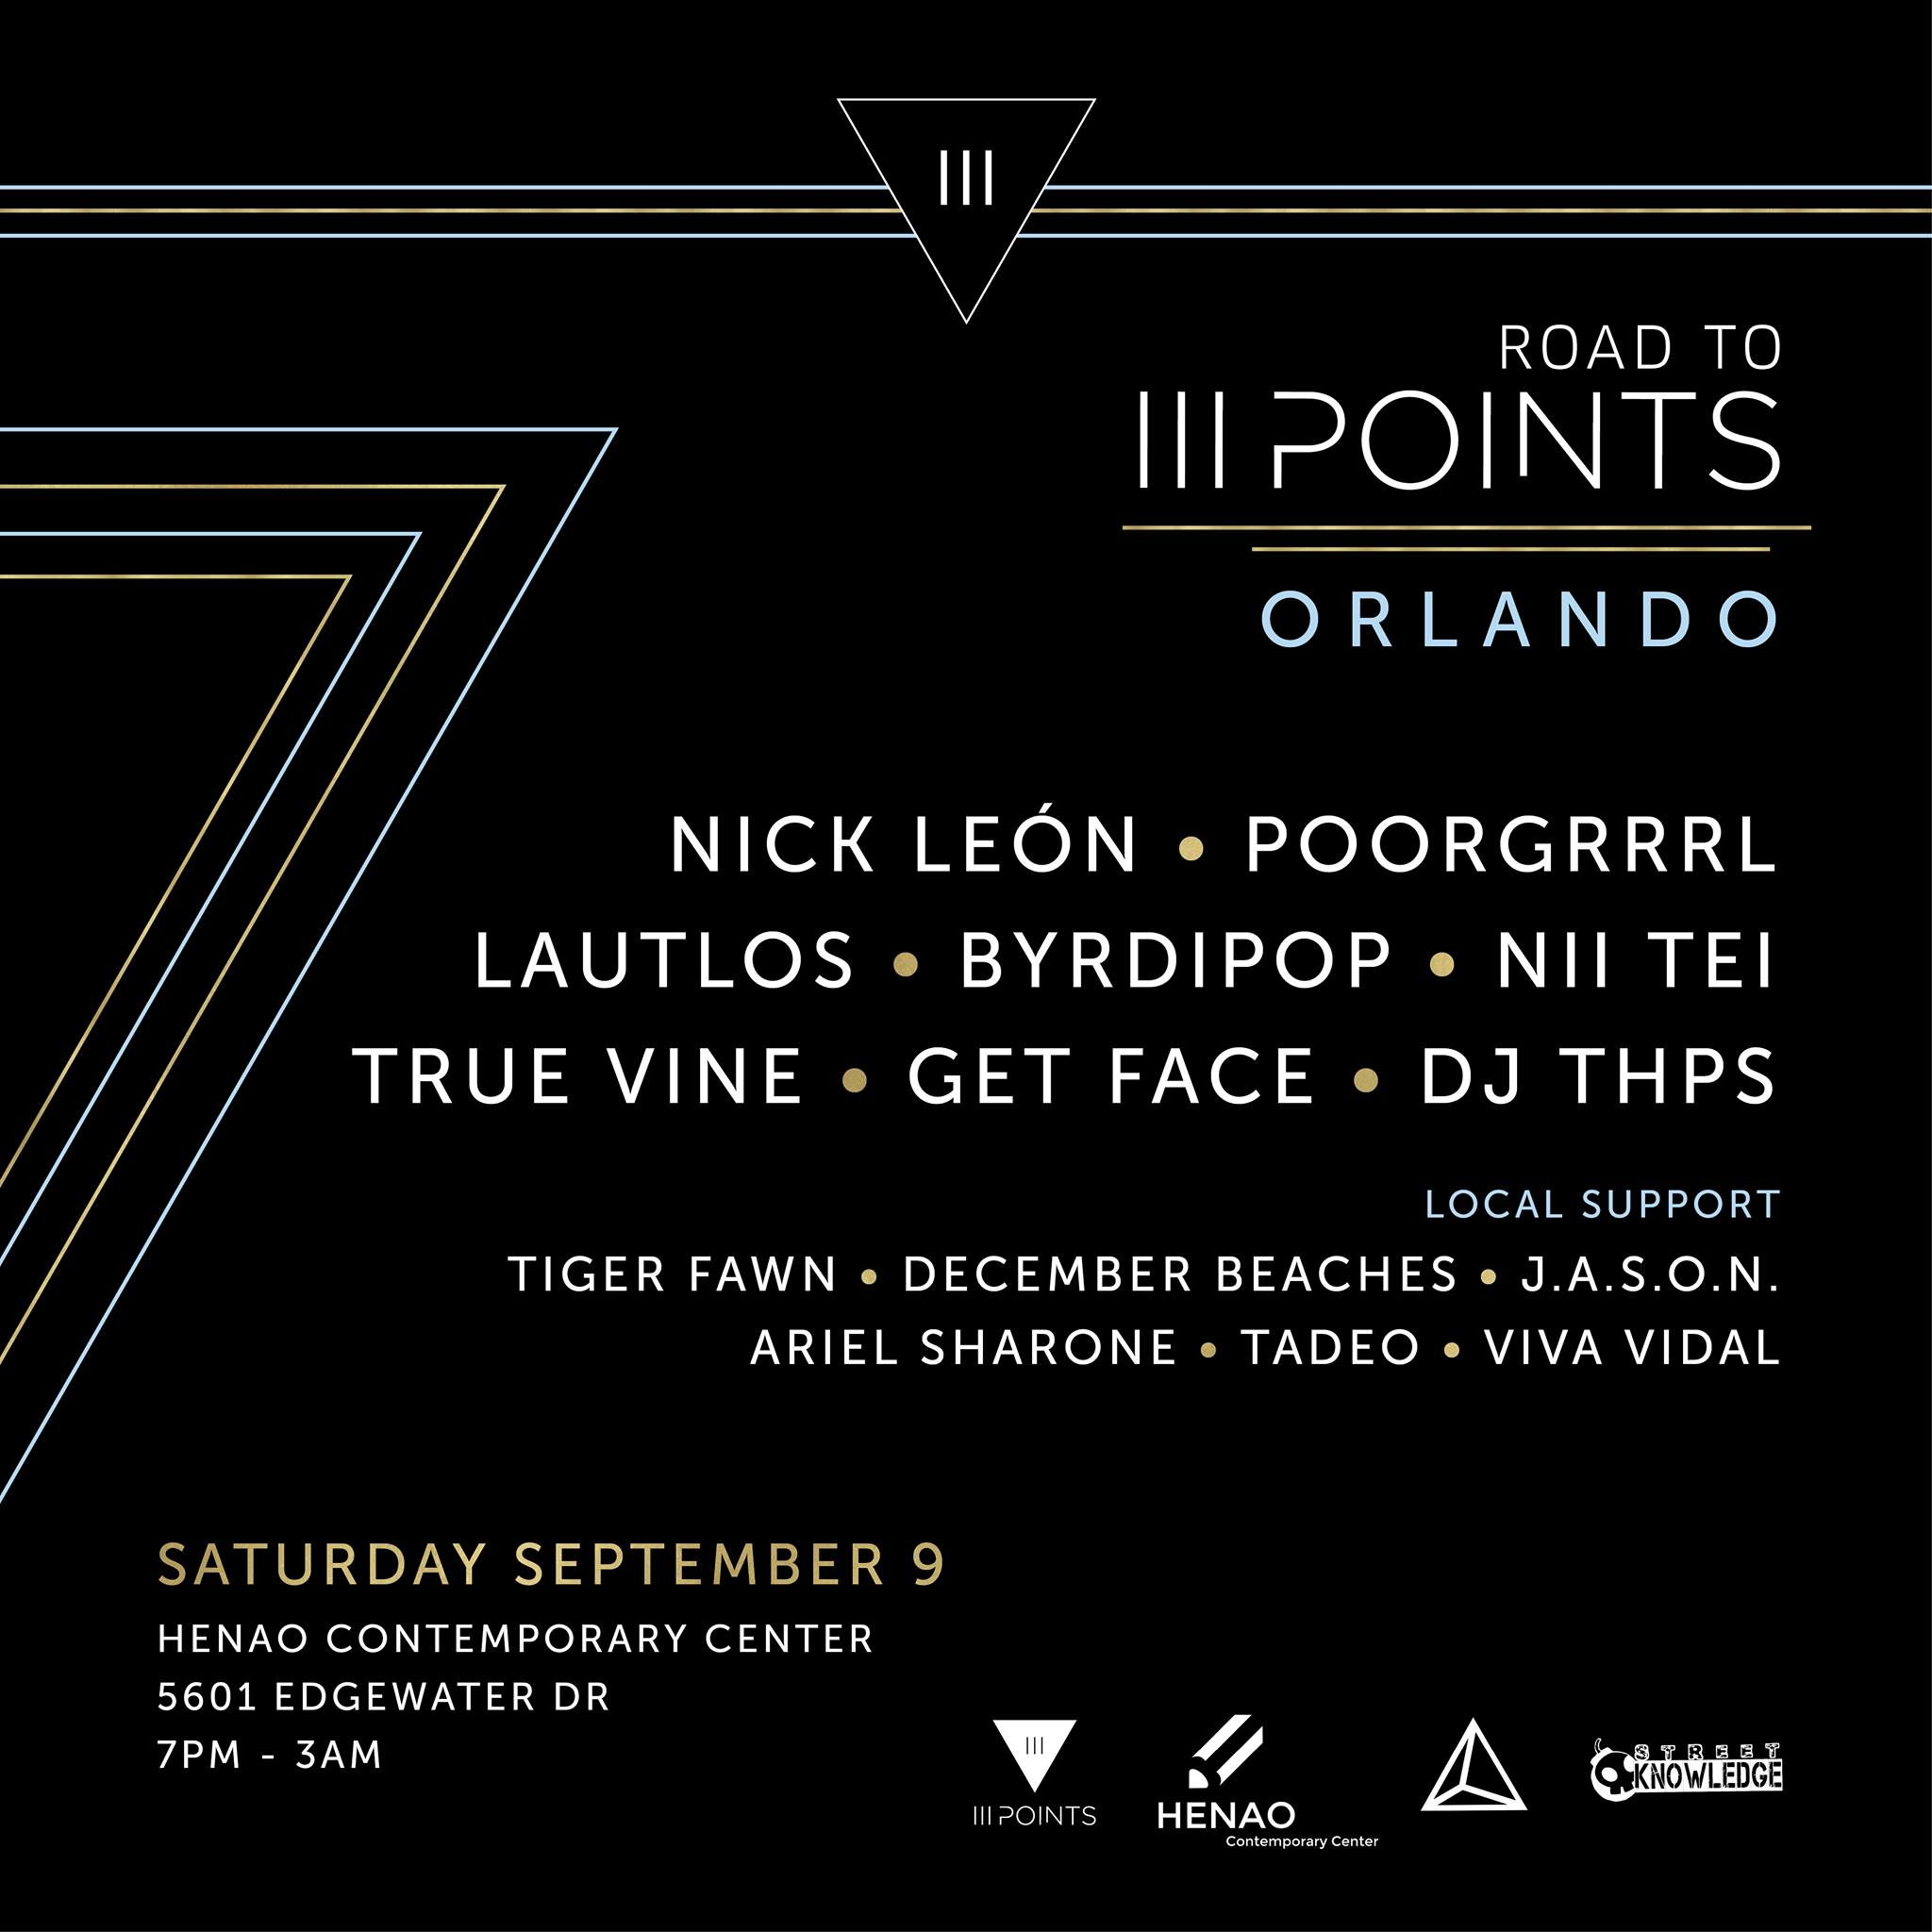 III Points Orlando